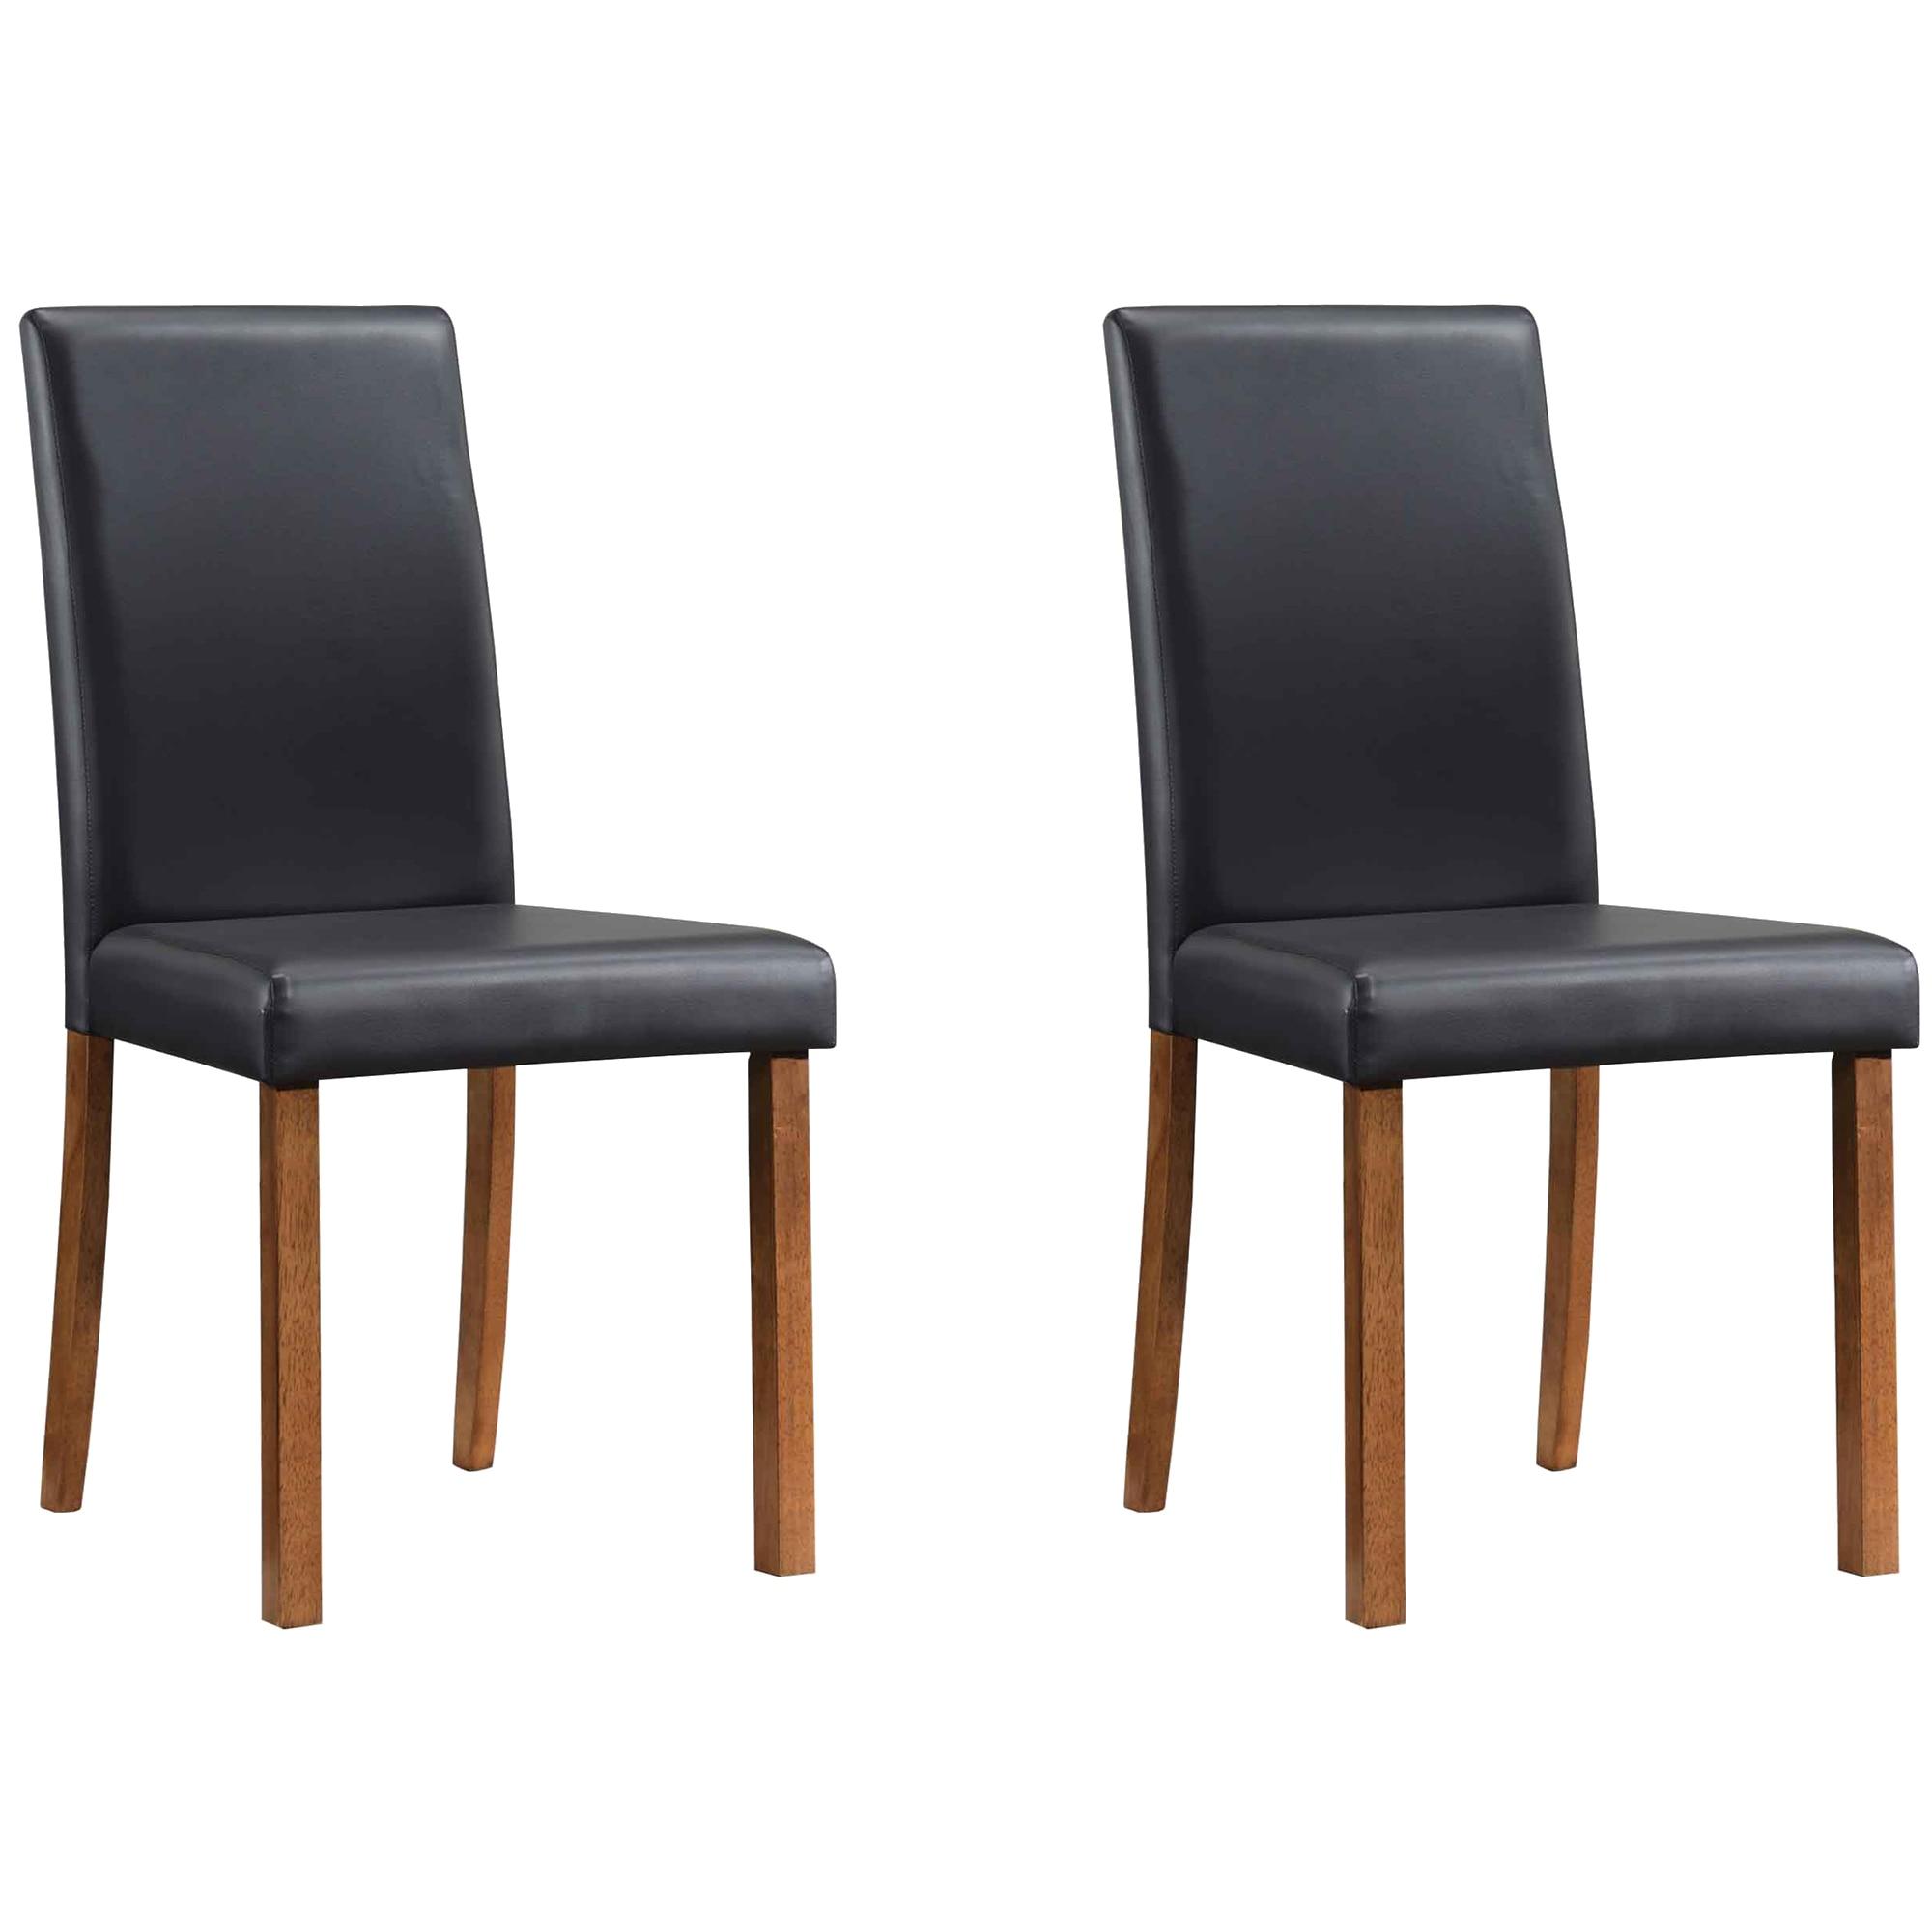 Fotografie Set 2 scaune dining Kring Minimal, 44.5x57.5x91.5 cm, Negru